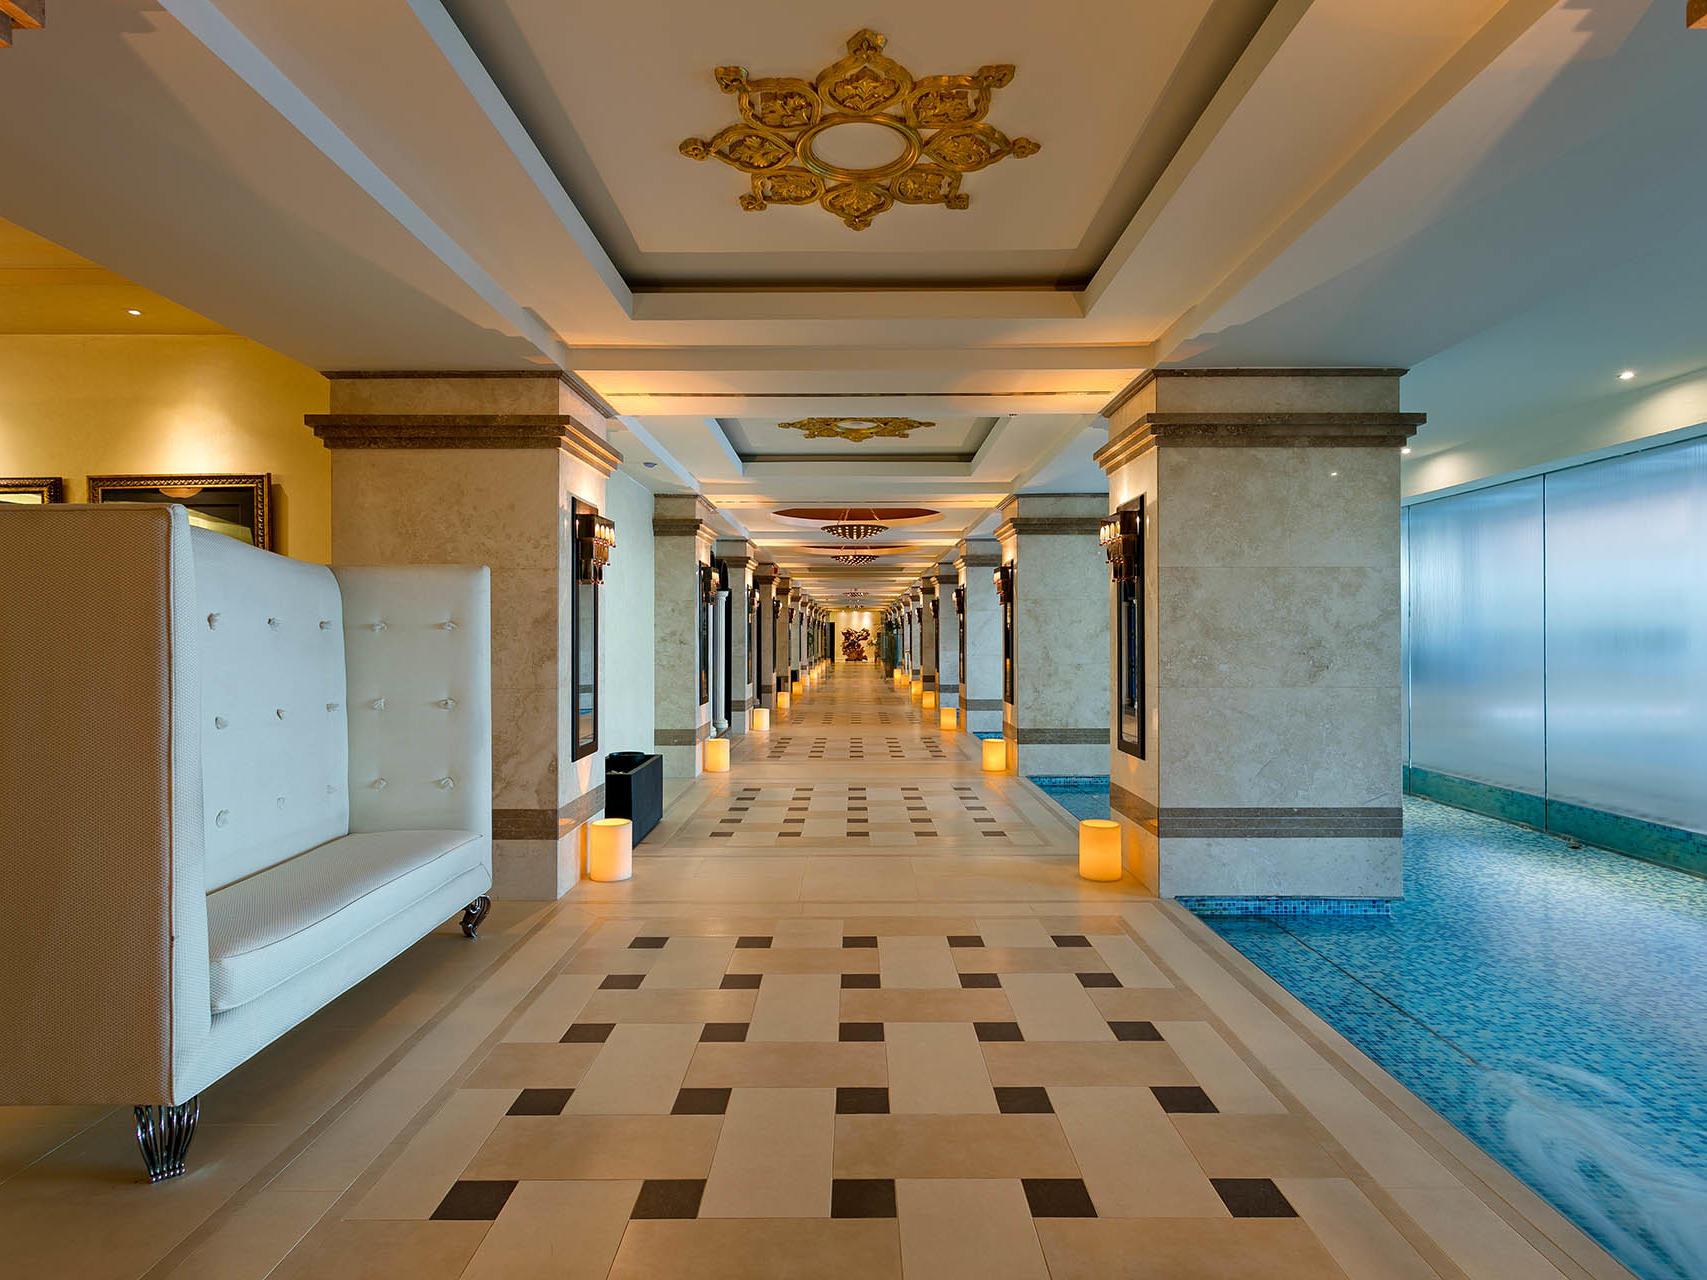 Mardanpalacehotel-Otel-Mermer-Dekorasyon- (12)